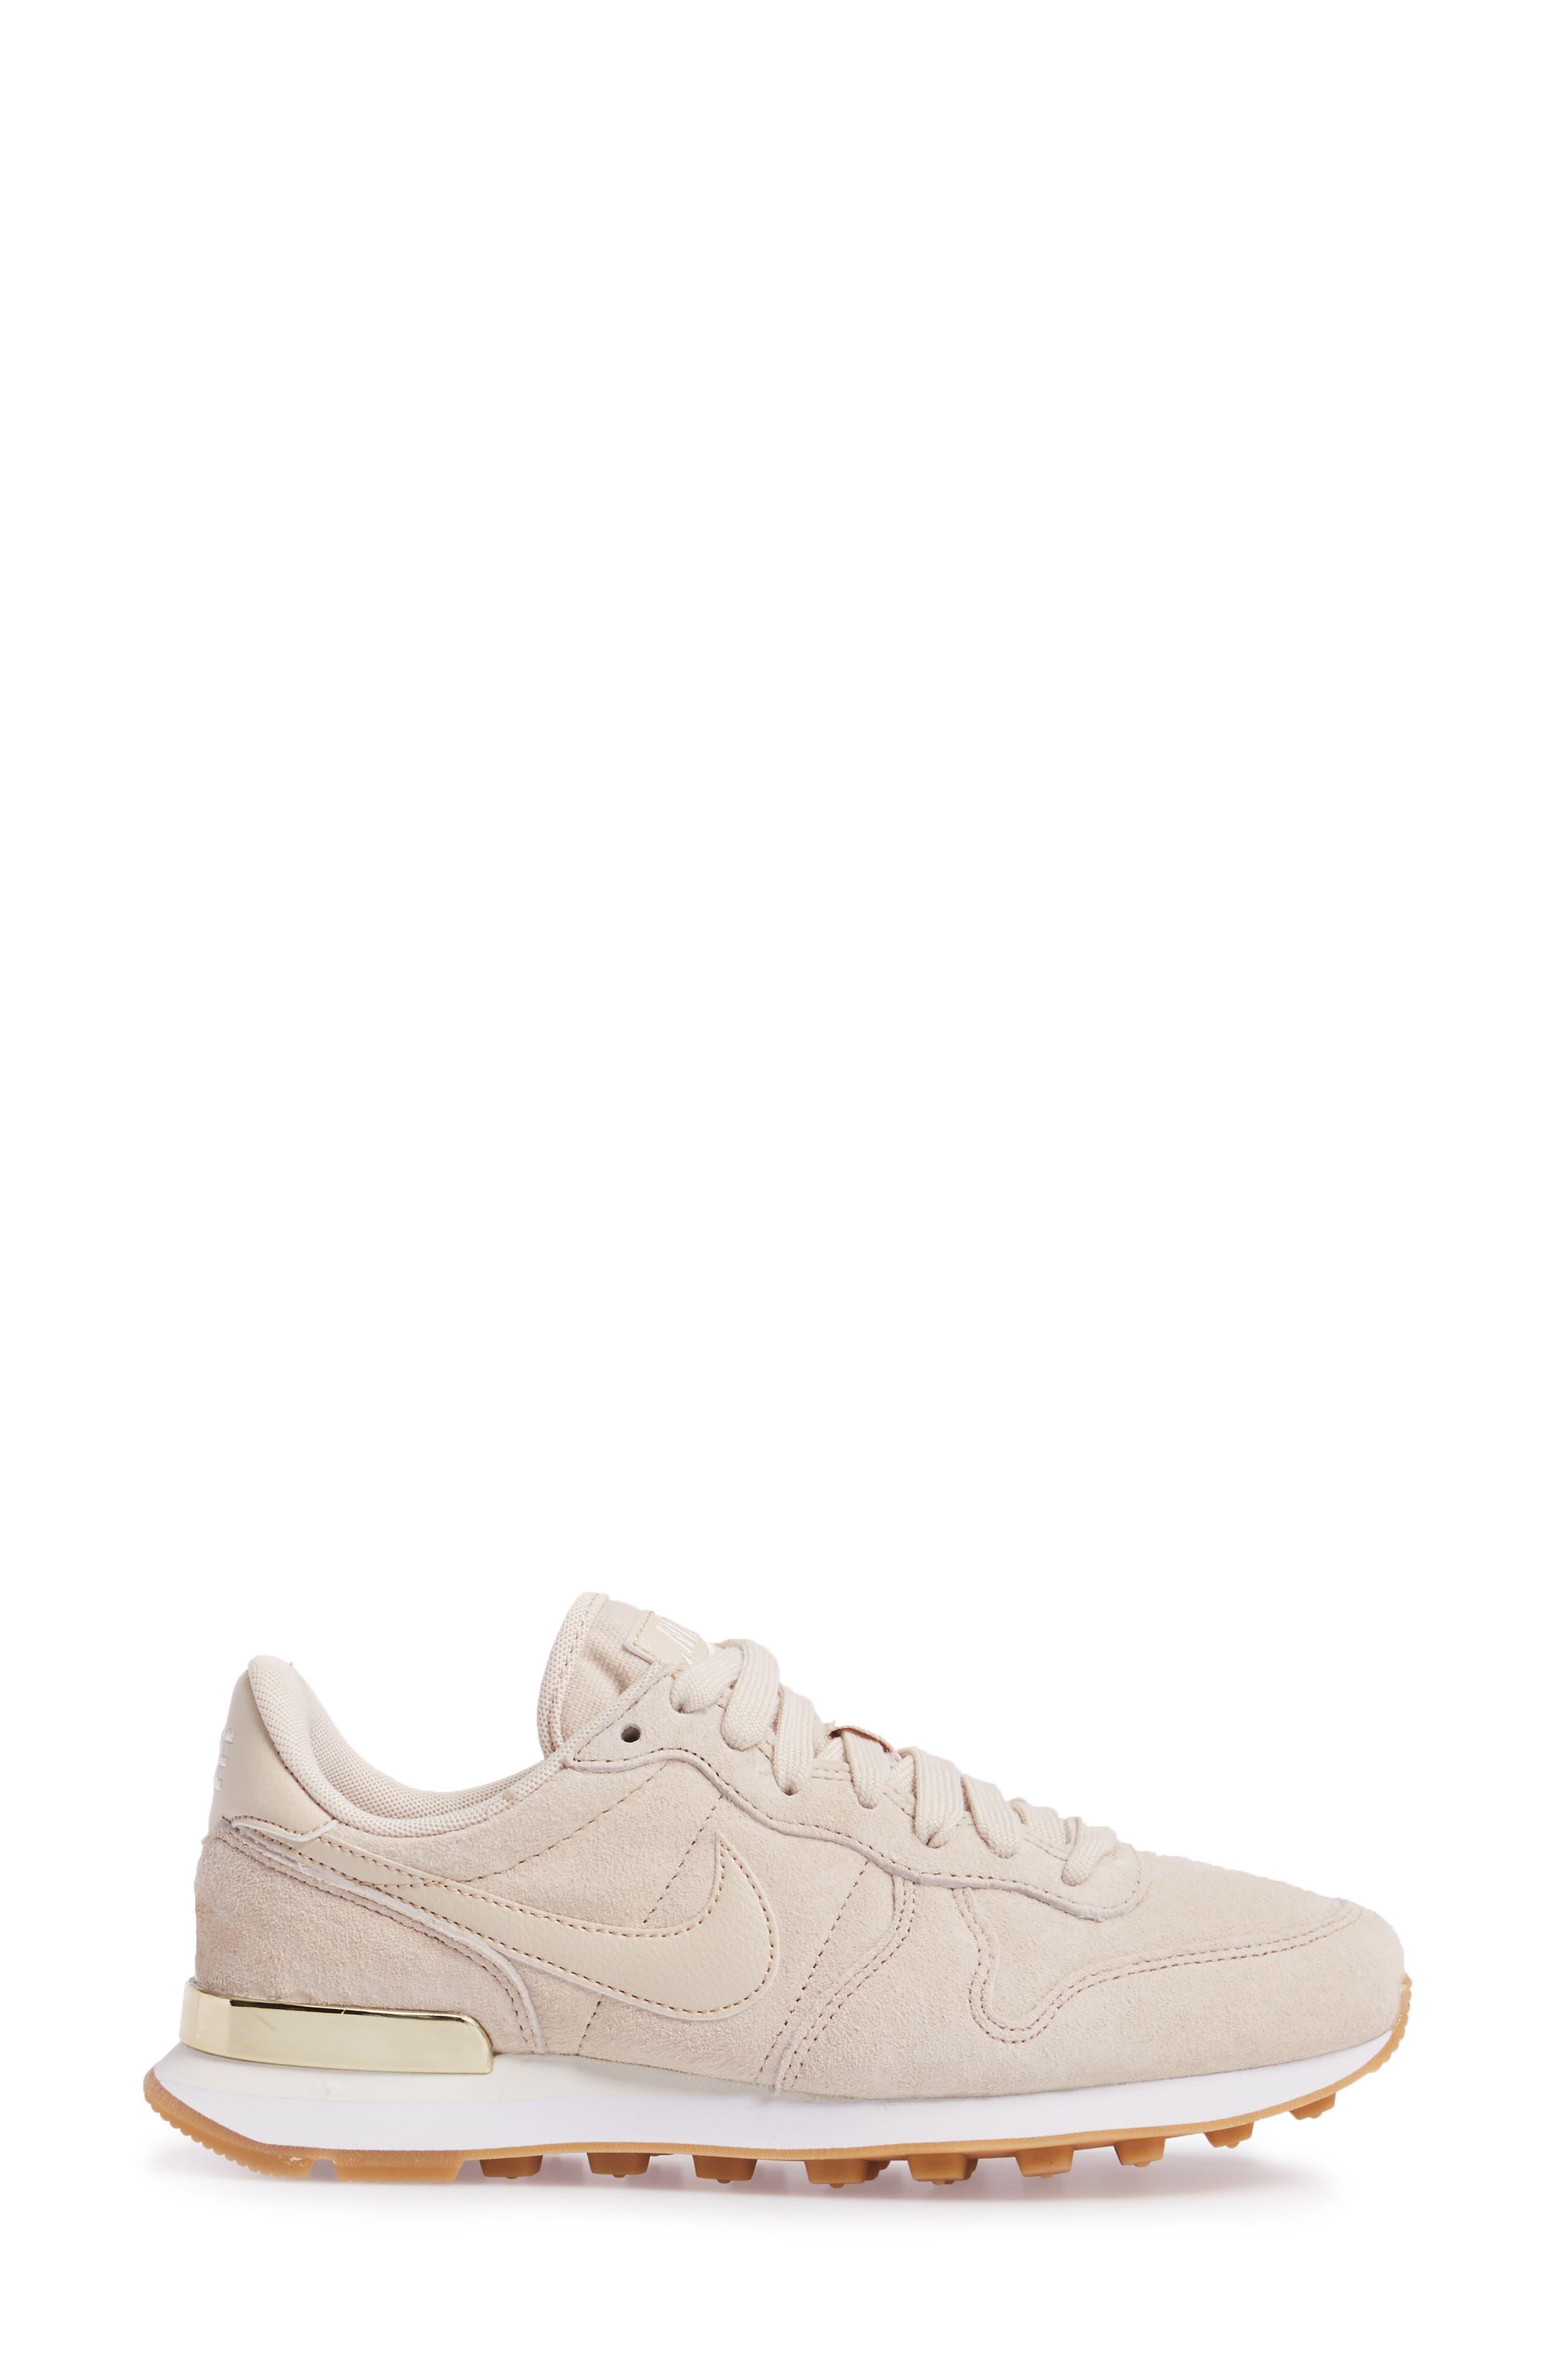 Internationalist SD Sneaker,                             Alternate thumbnail 3, color,                             250